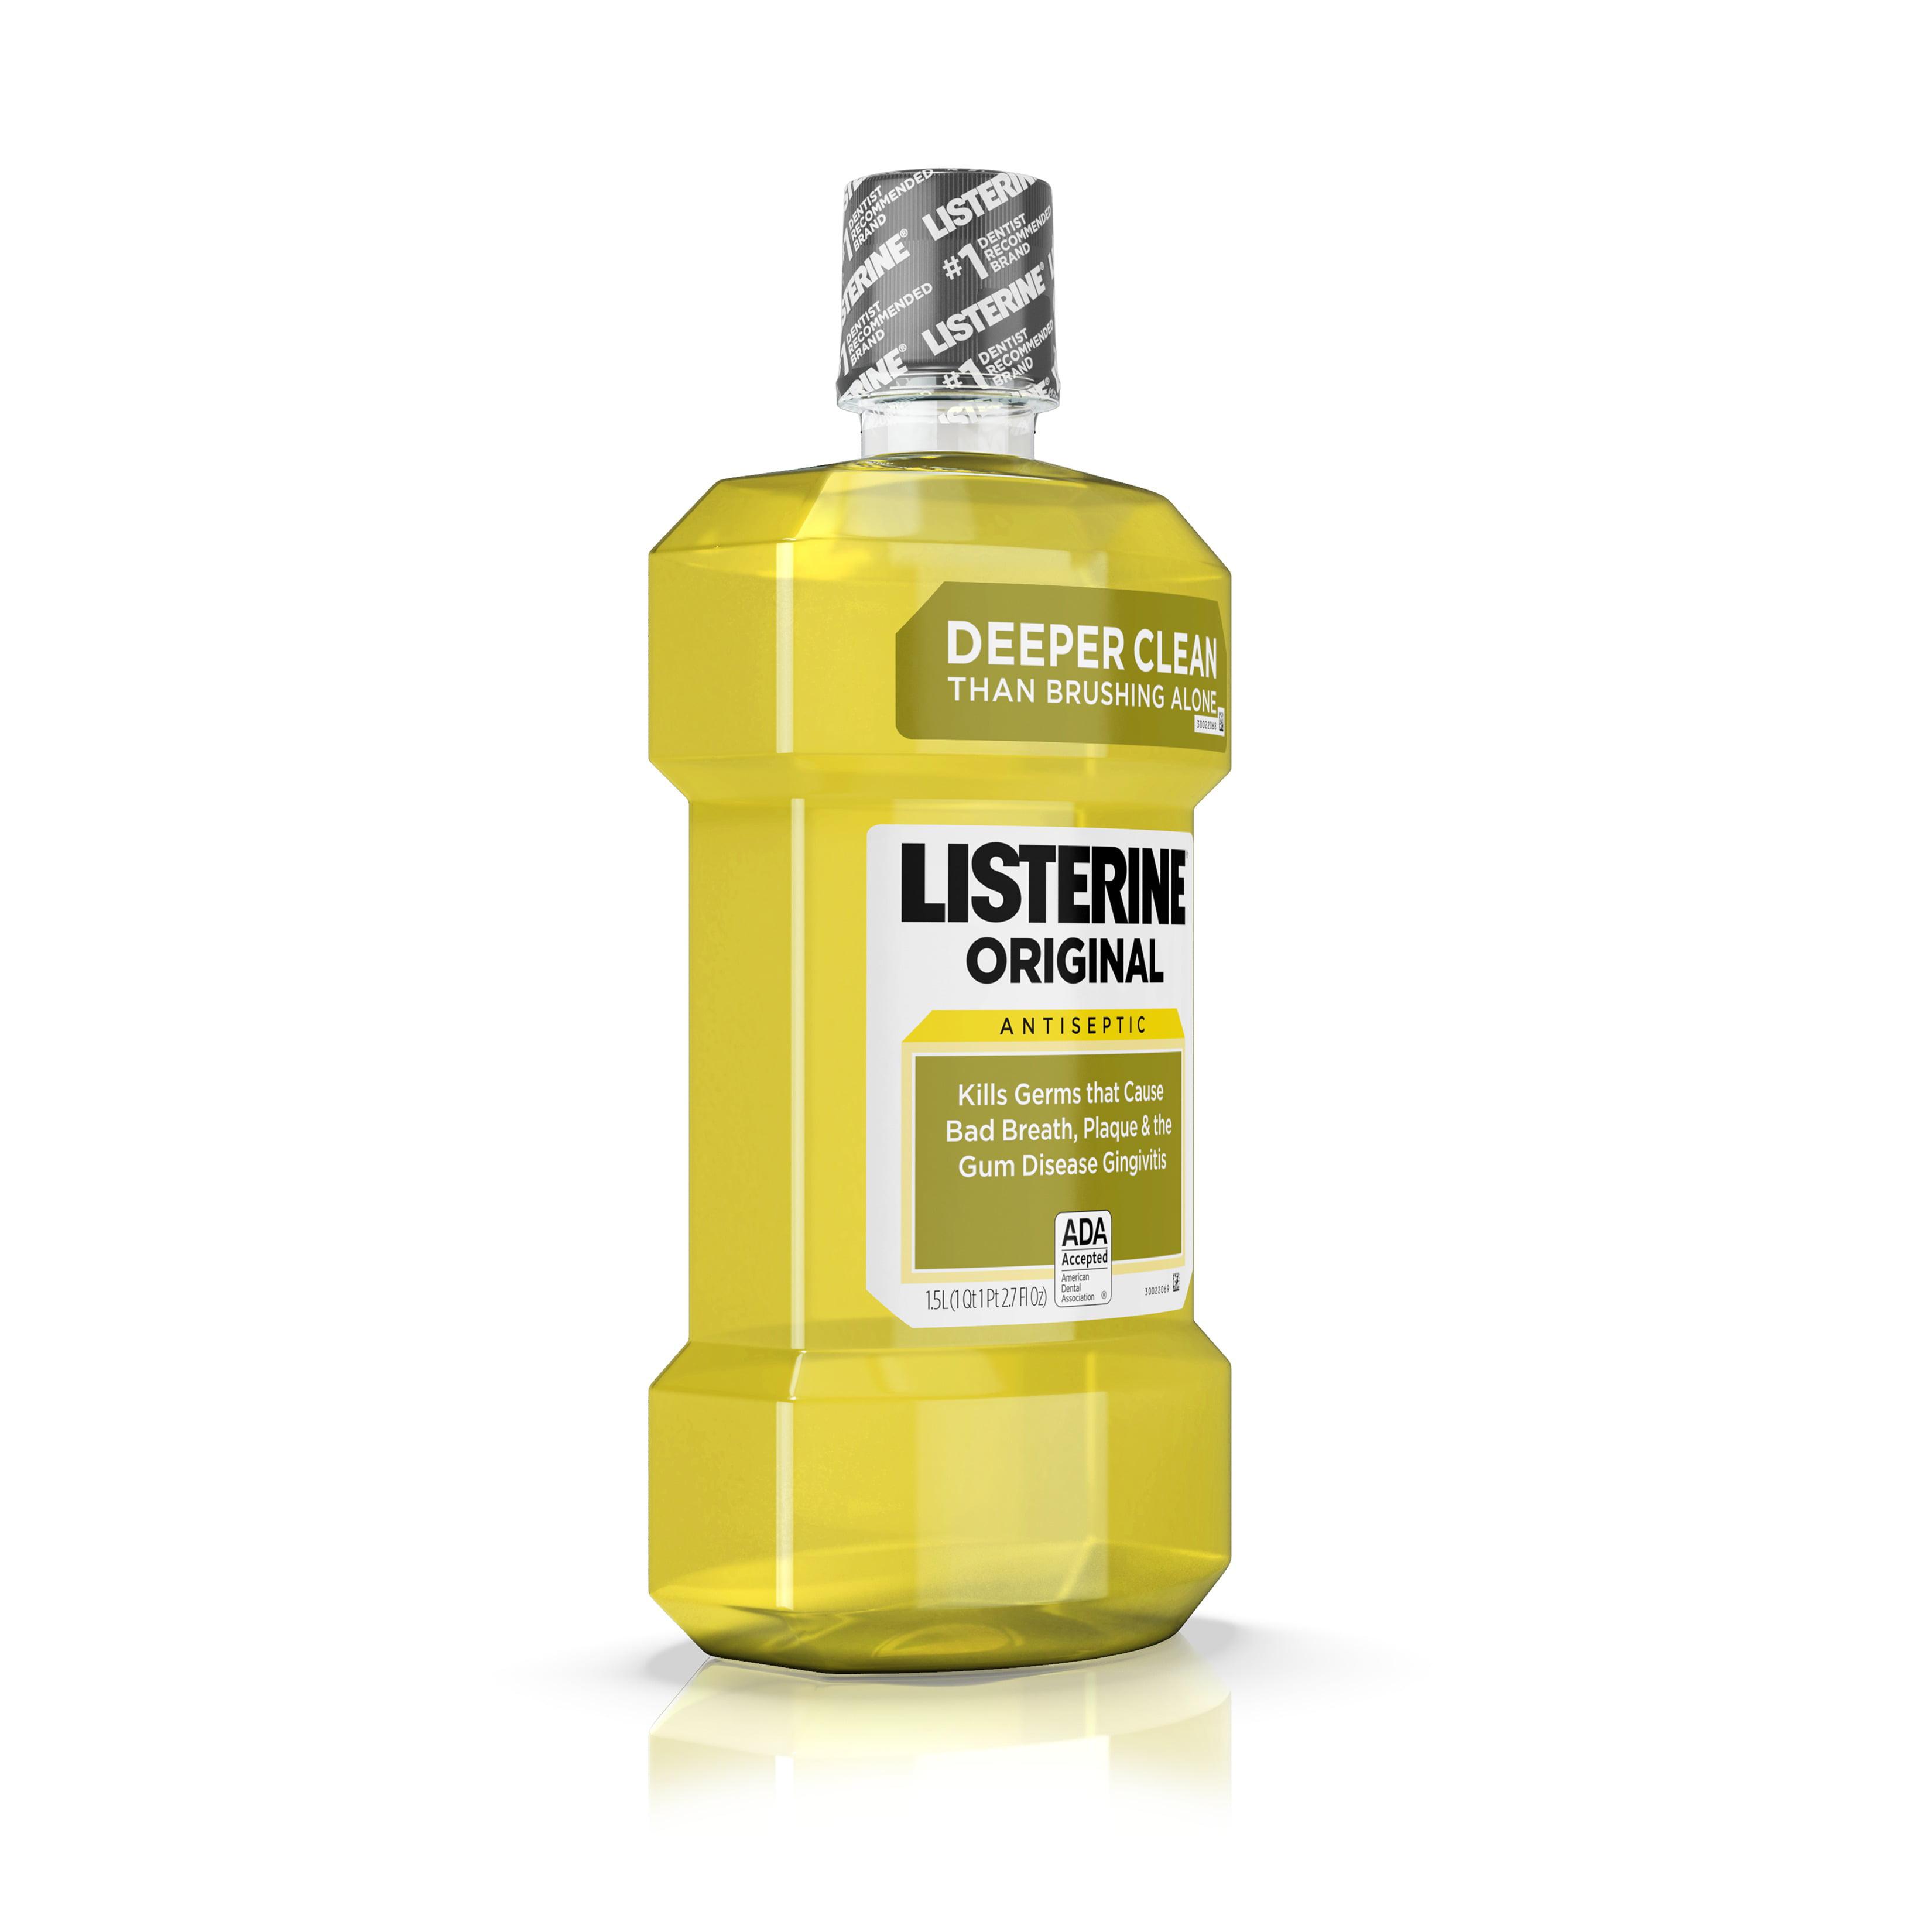 Listerine ORIGINAL - 1.5L